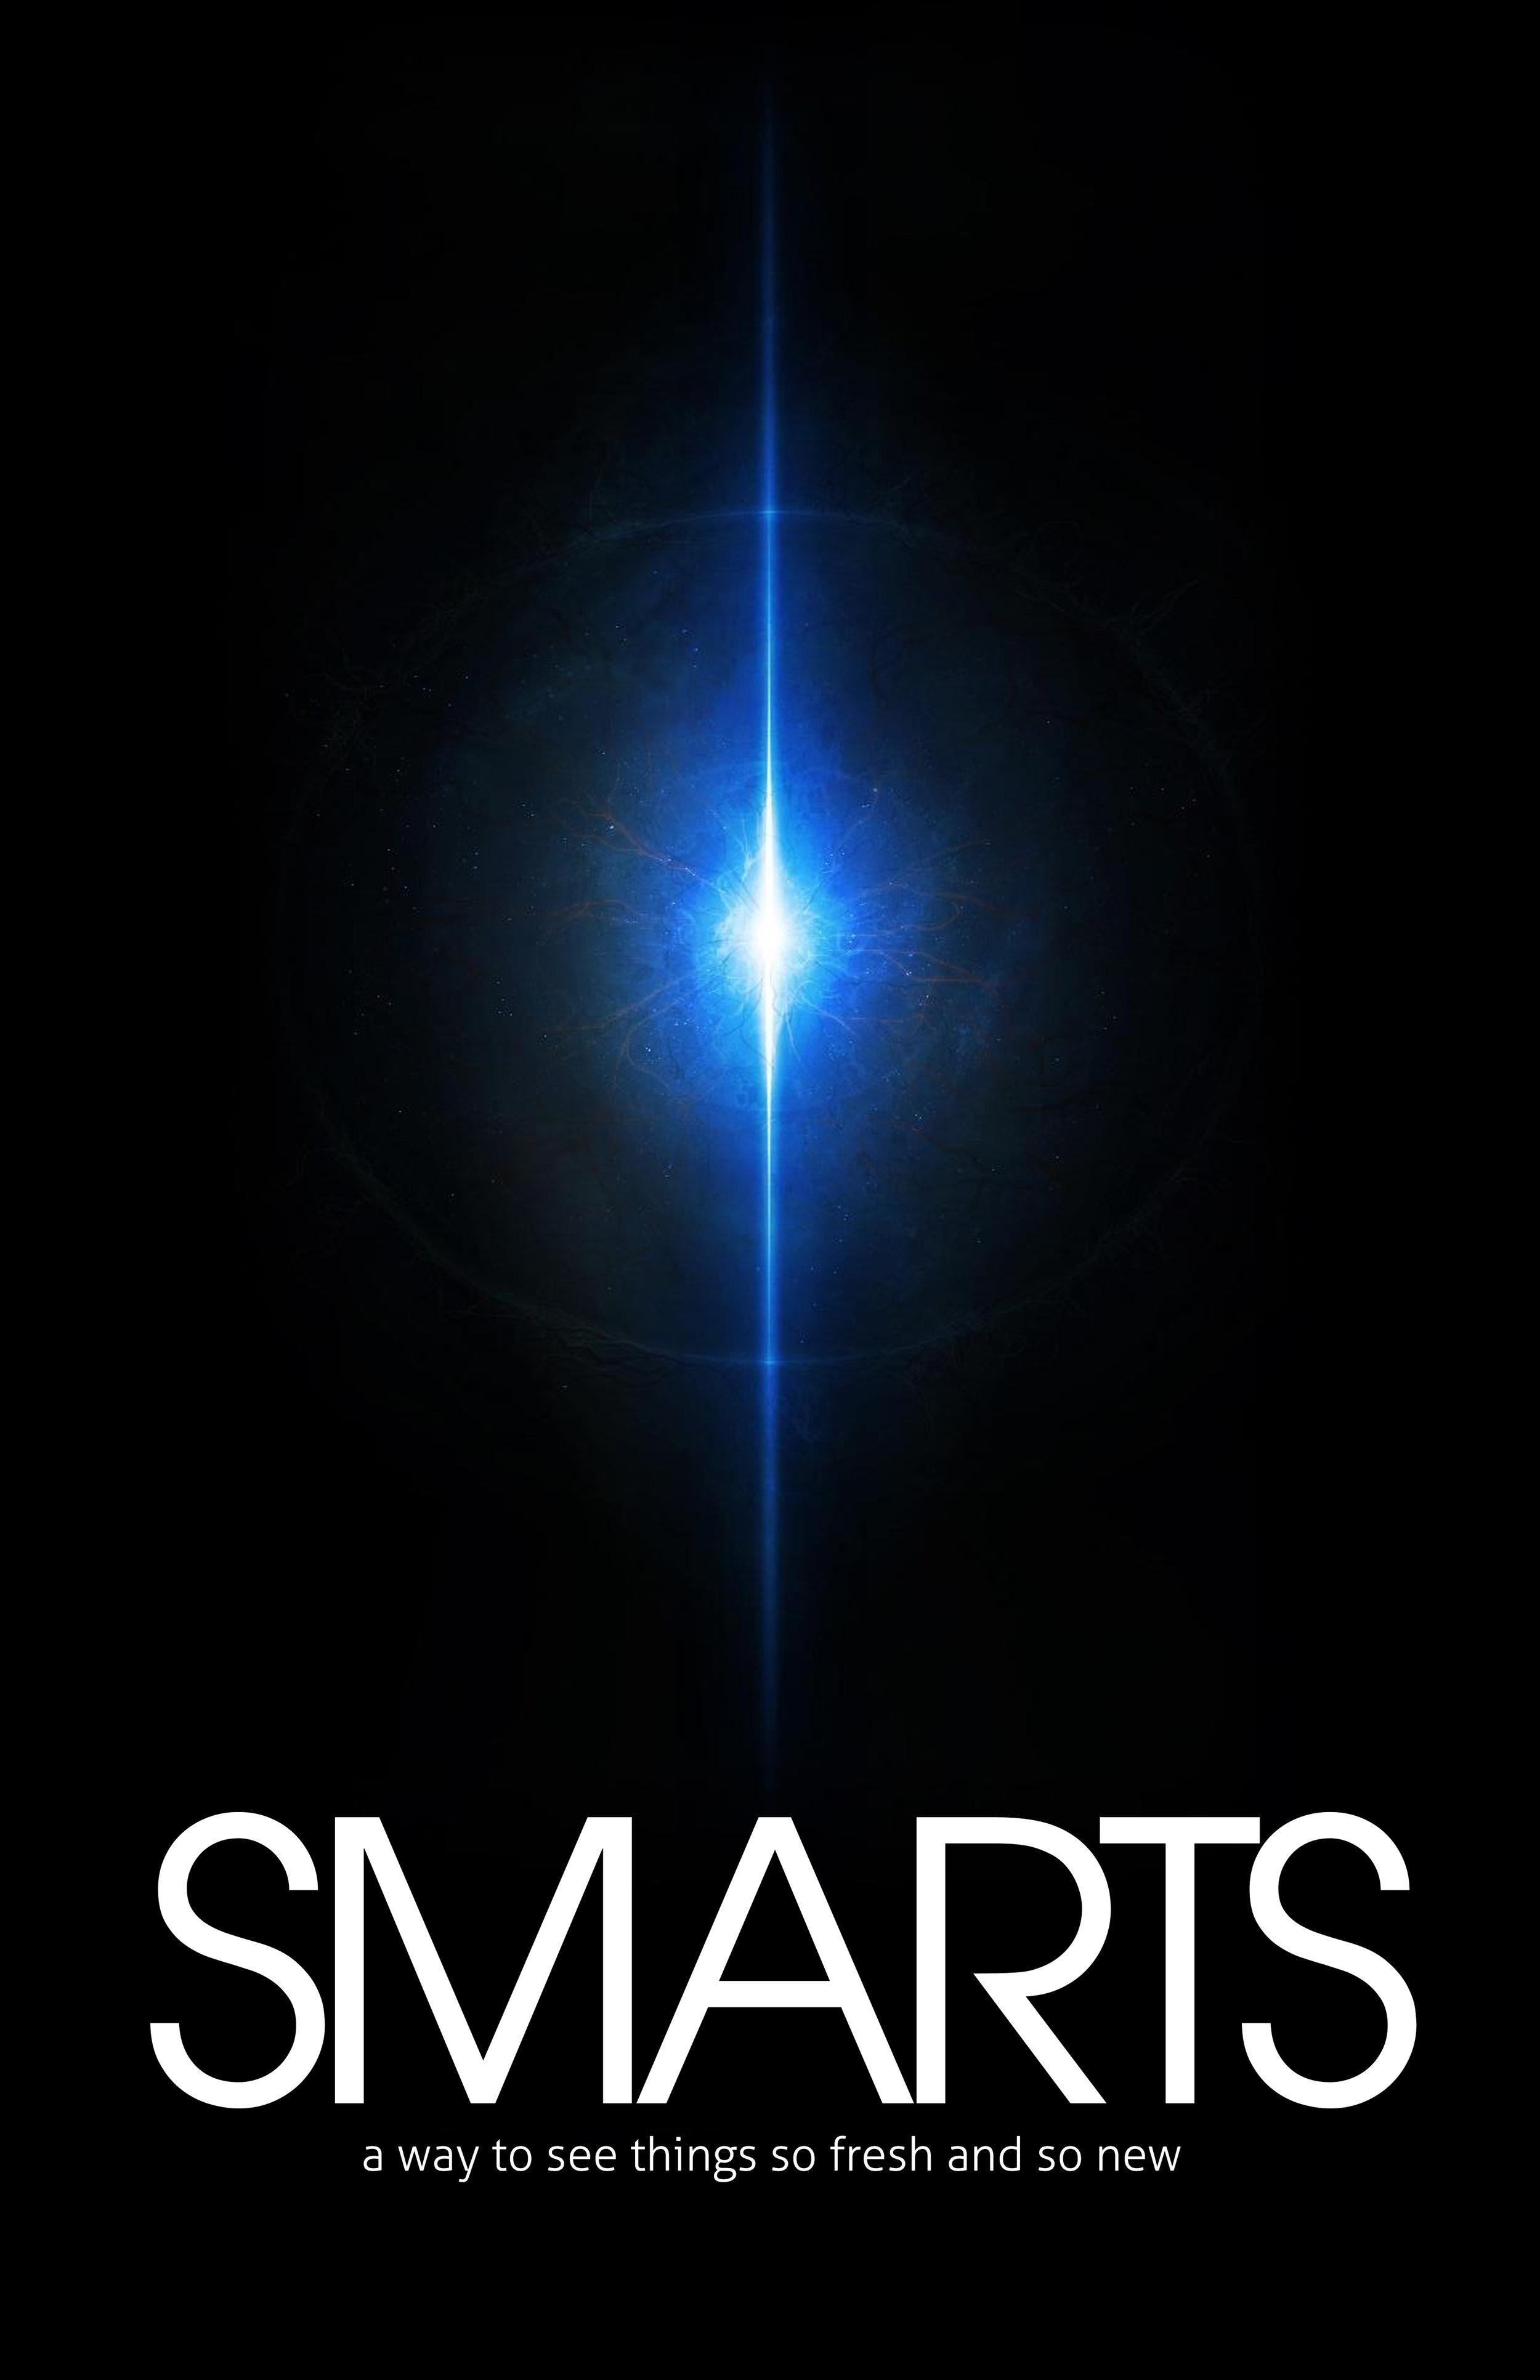 Smarts_One-Sheet.jpg